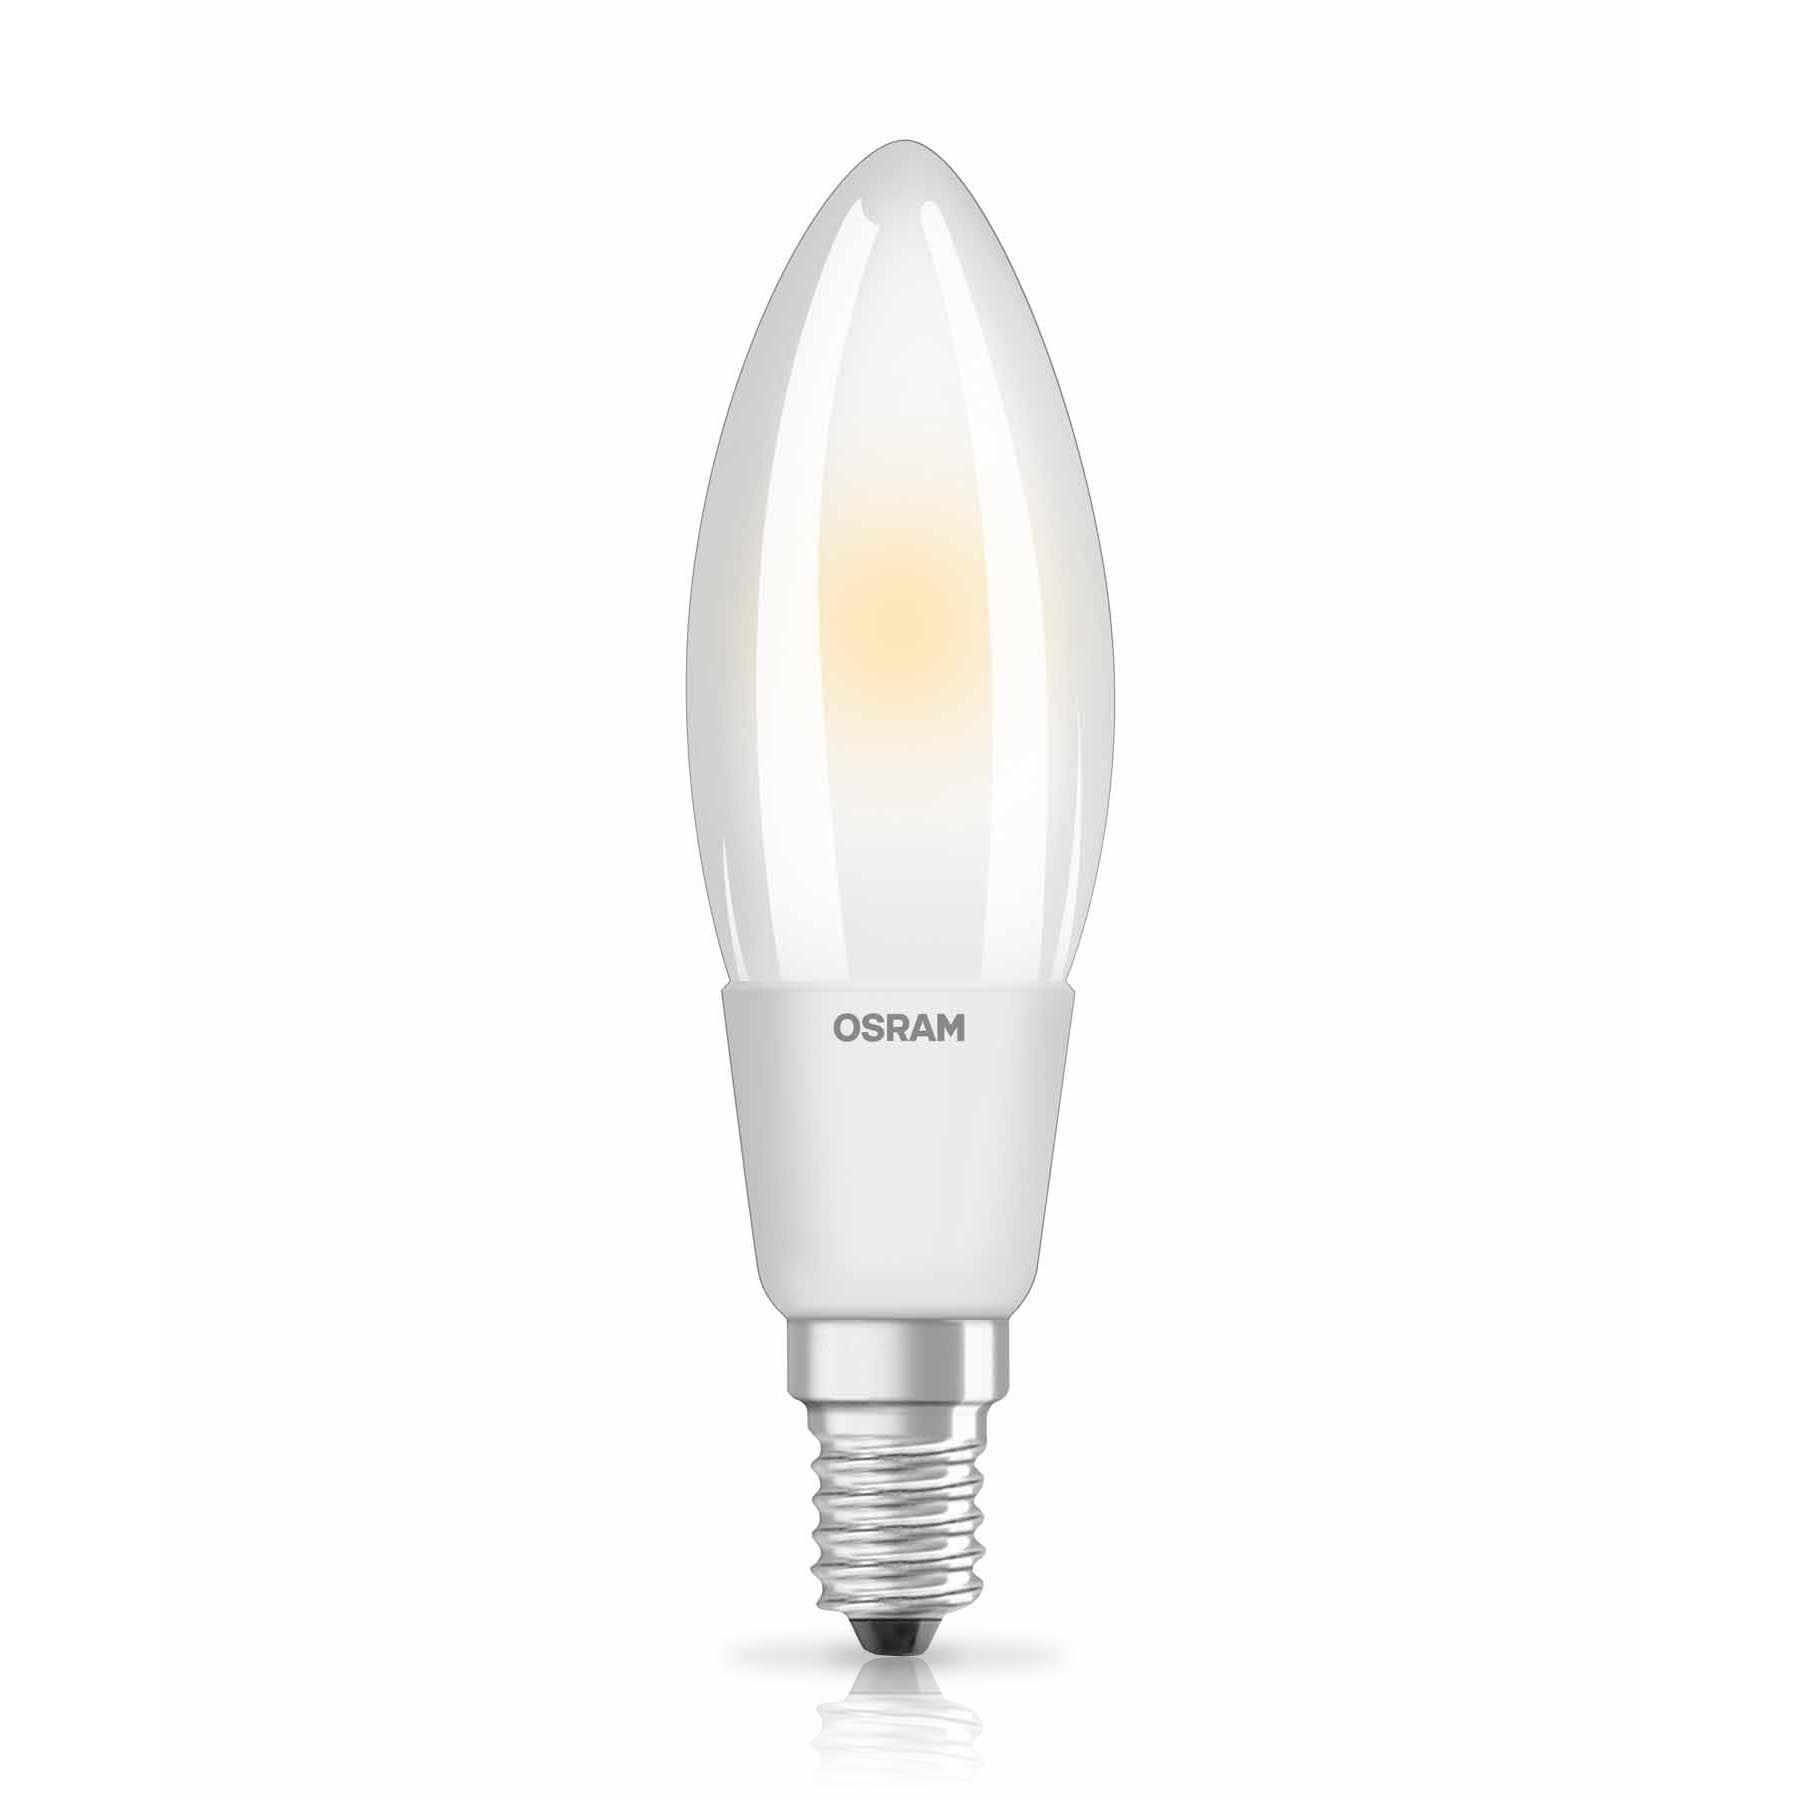 LED Bulb Osram LED SUPERSTAR RETROFIT FR DIM CLB 50 5W 827 E14 2700K 640lm